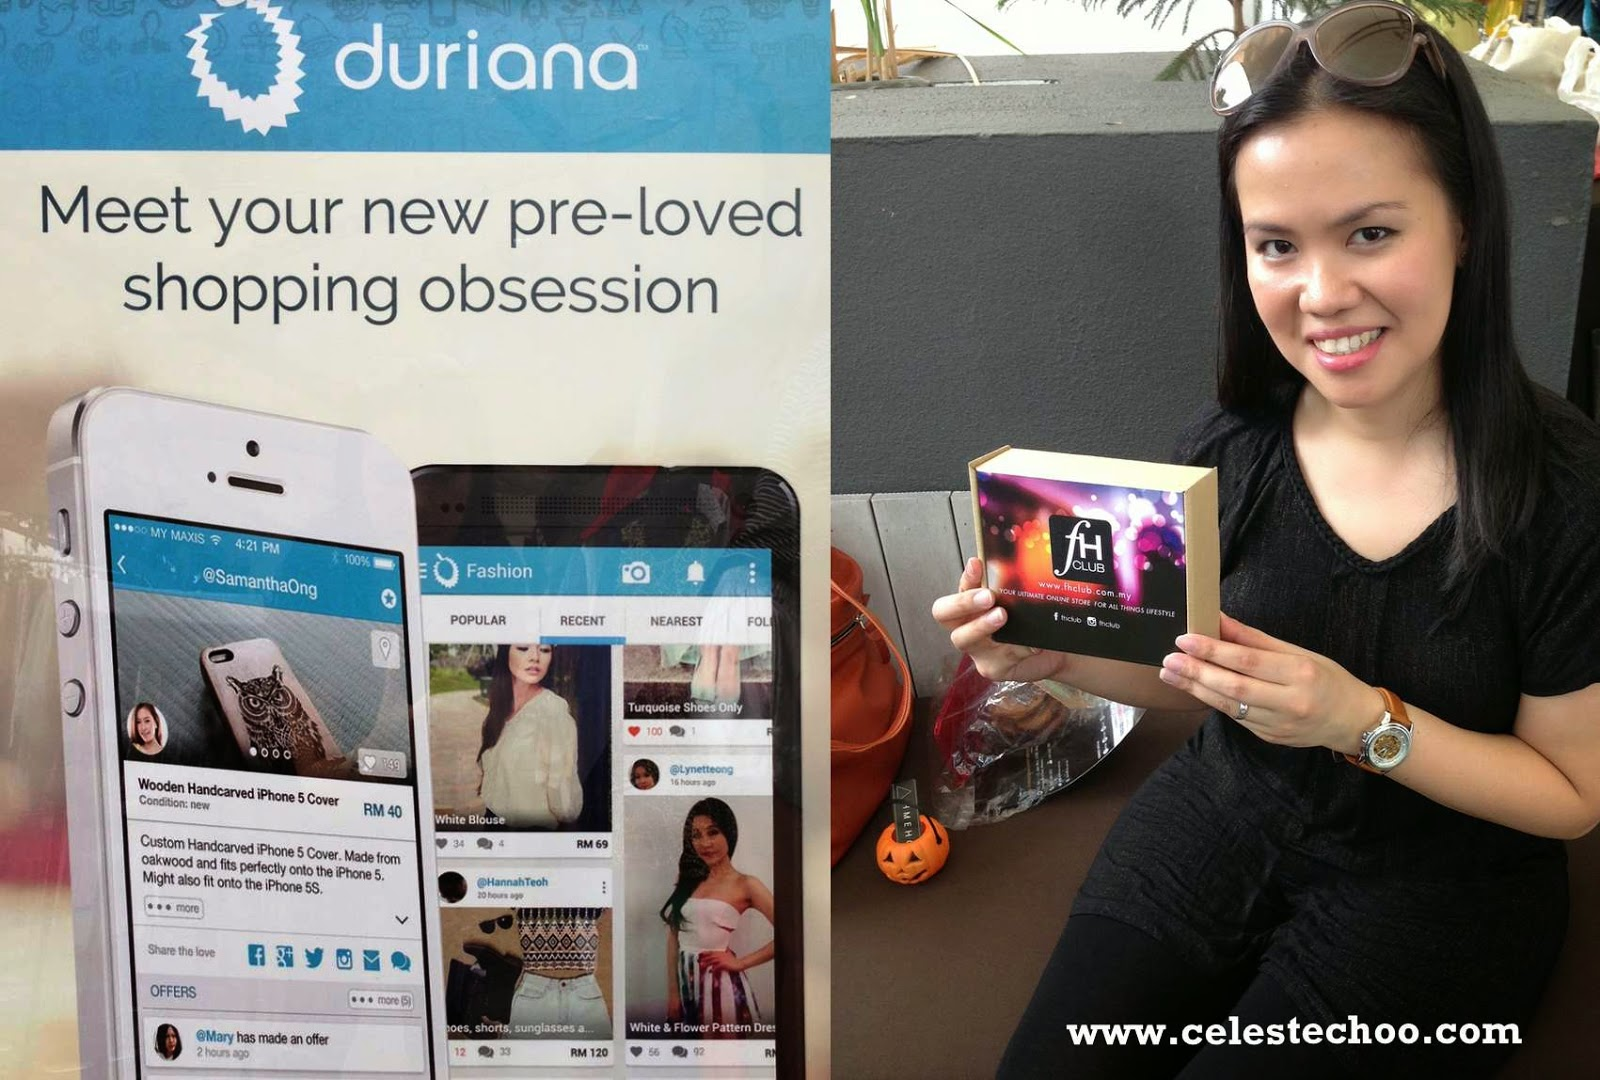 duriana_online_shopping_marketplace_blogger